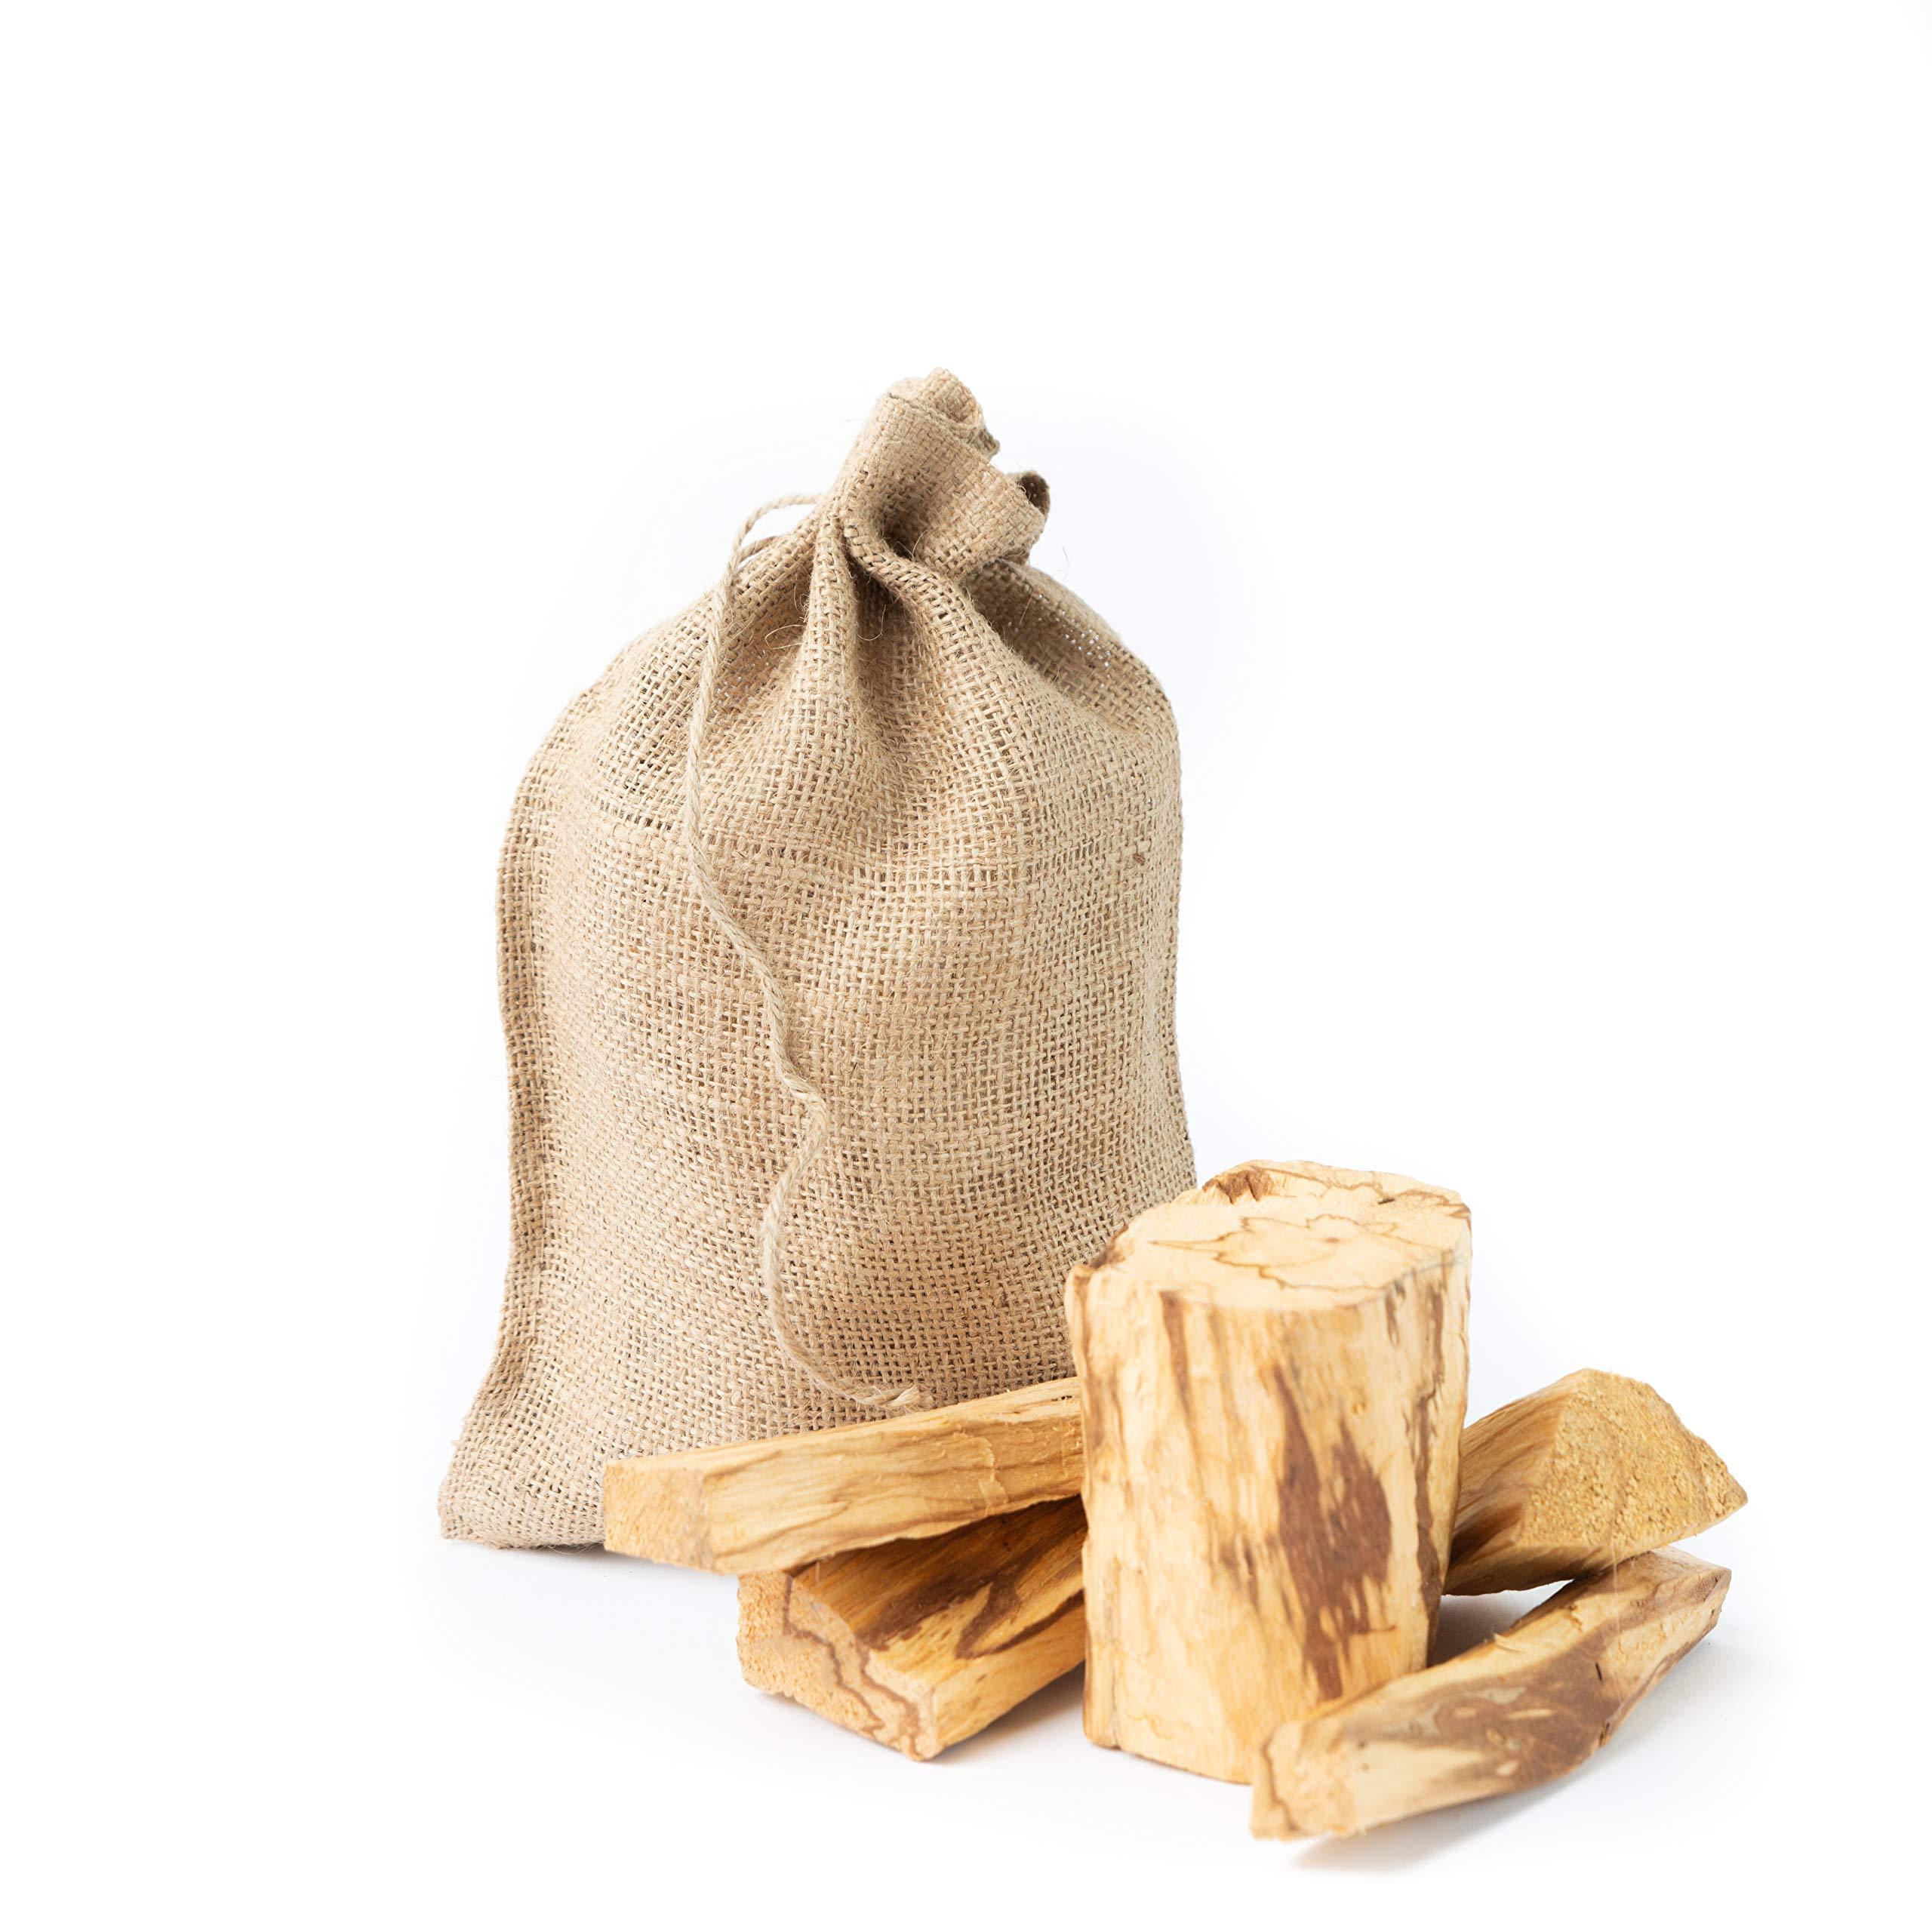 Luna Sundara Palo Santo from Perú Smudging Sticks Large Chunks, High Resin 1 Pound Bag. by Luna Sundara (Image #1)